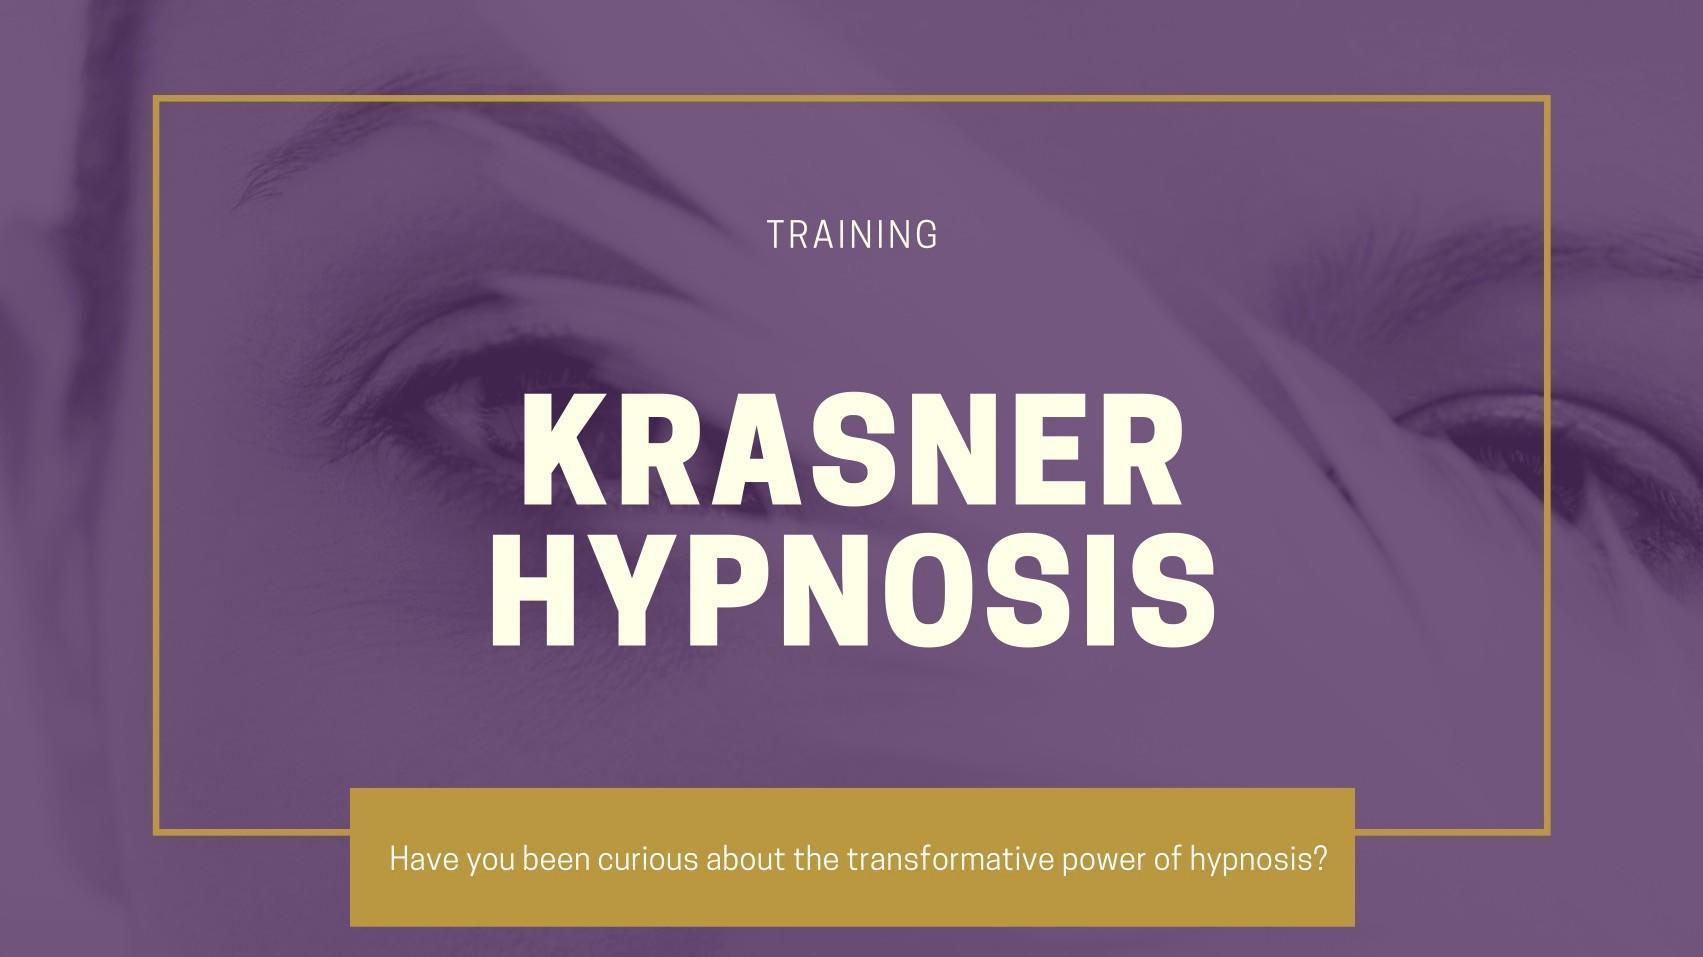 krasner hypnosis